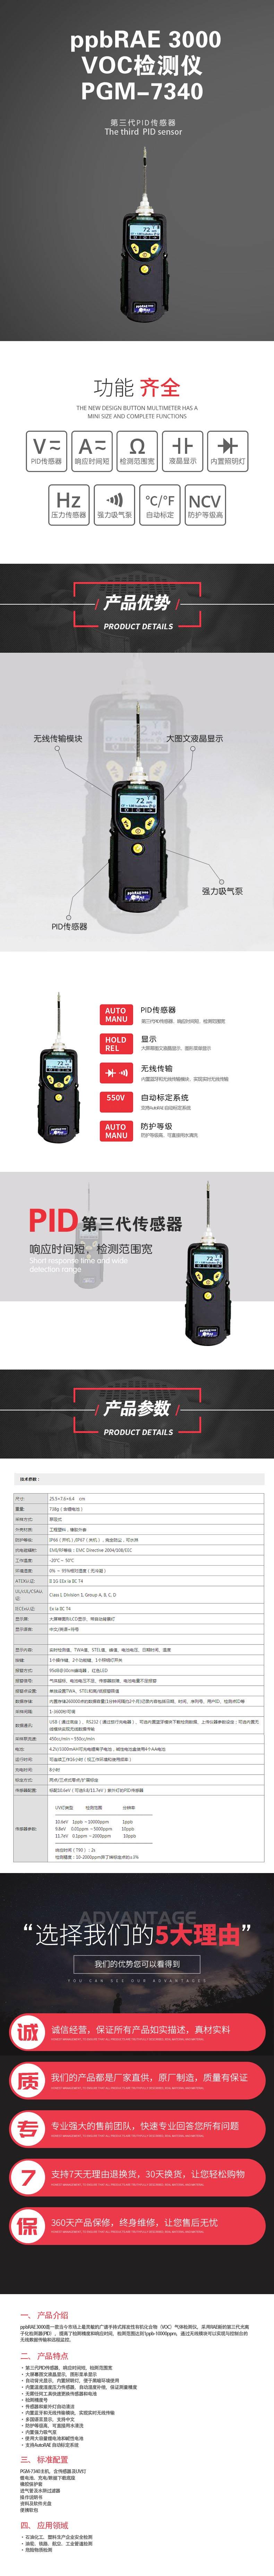 ppbRAE-3000-VOC检测仪-PGM-7340.jpg